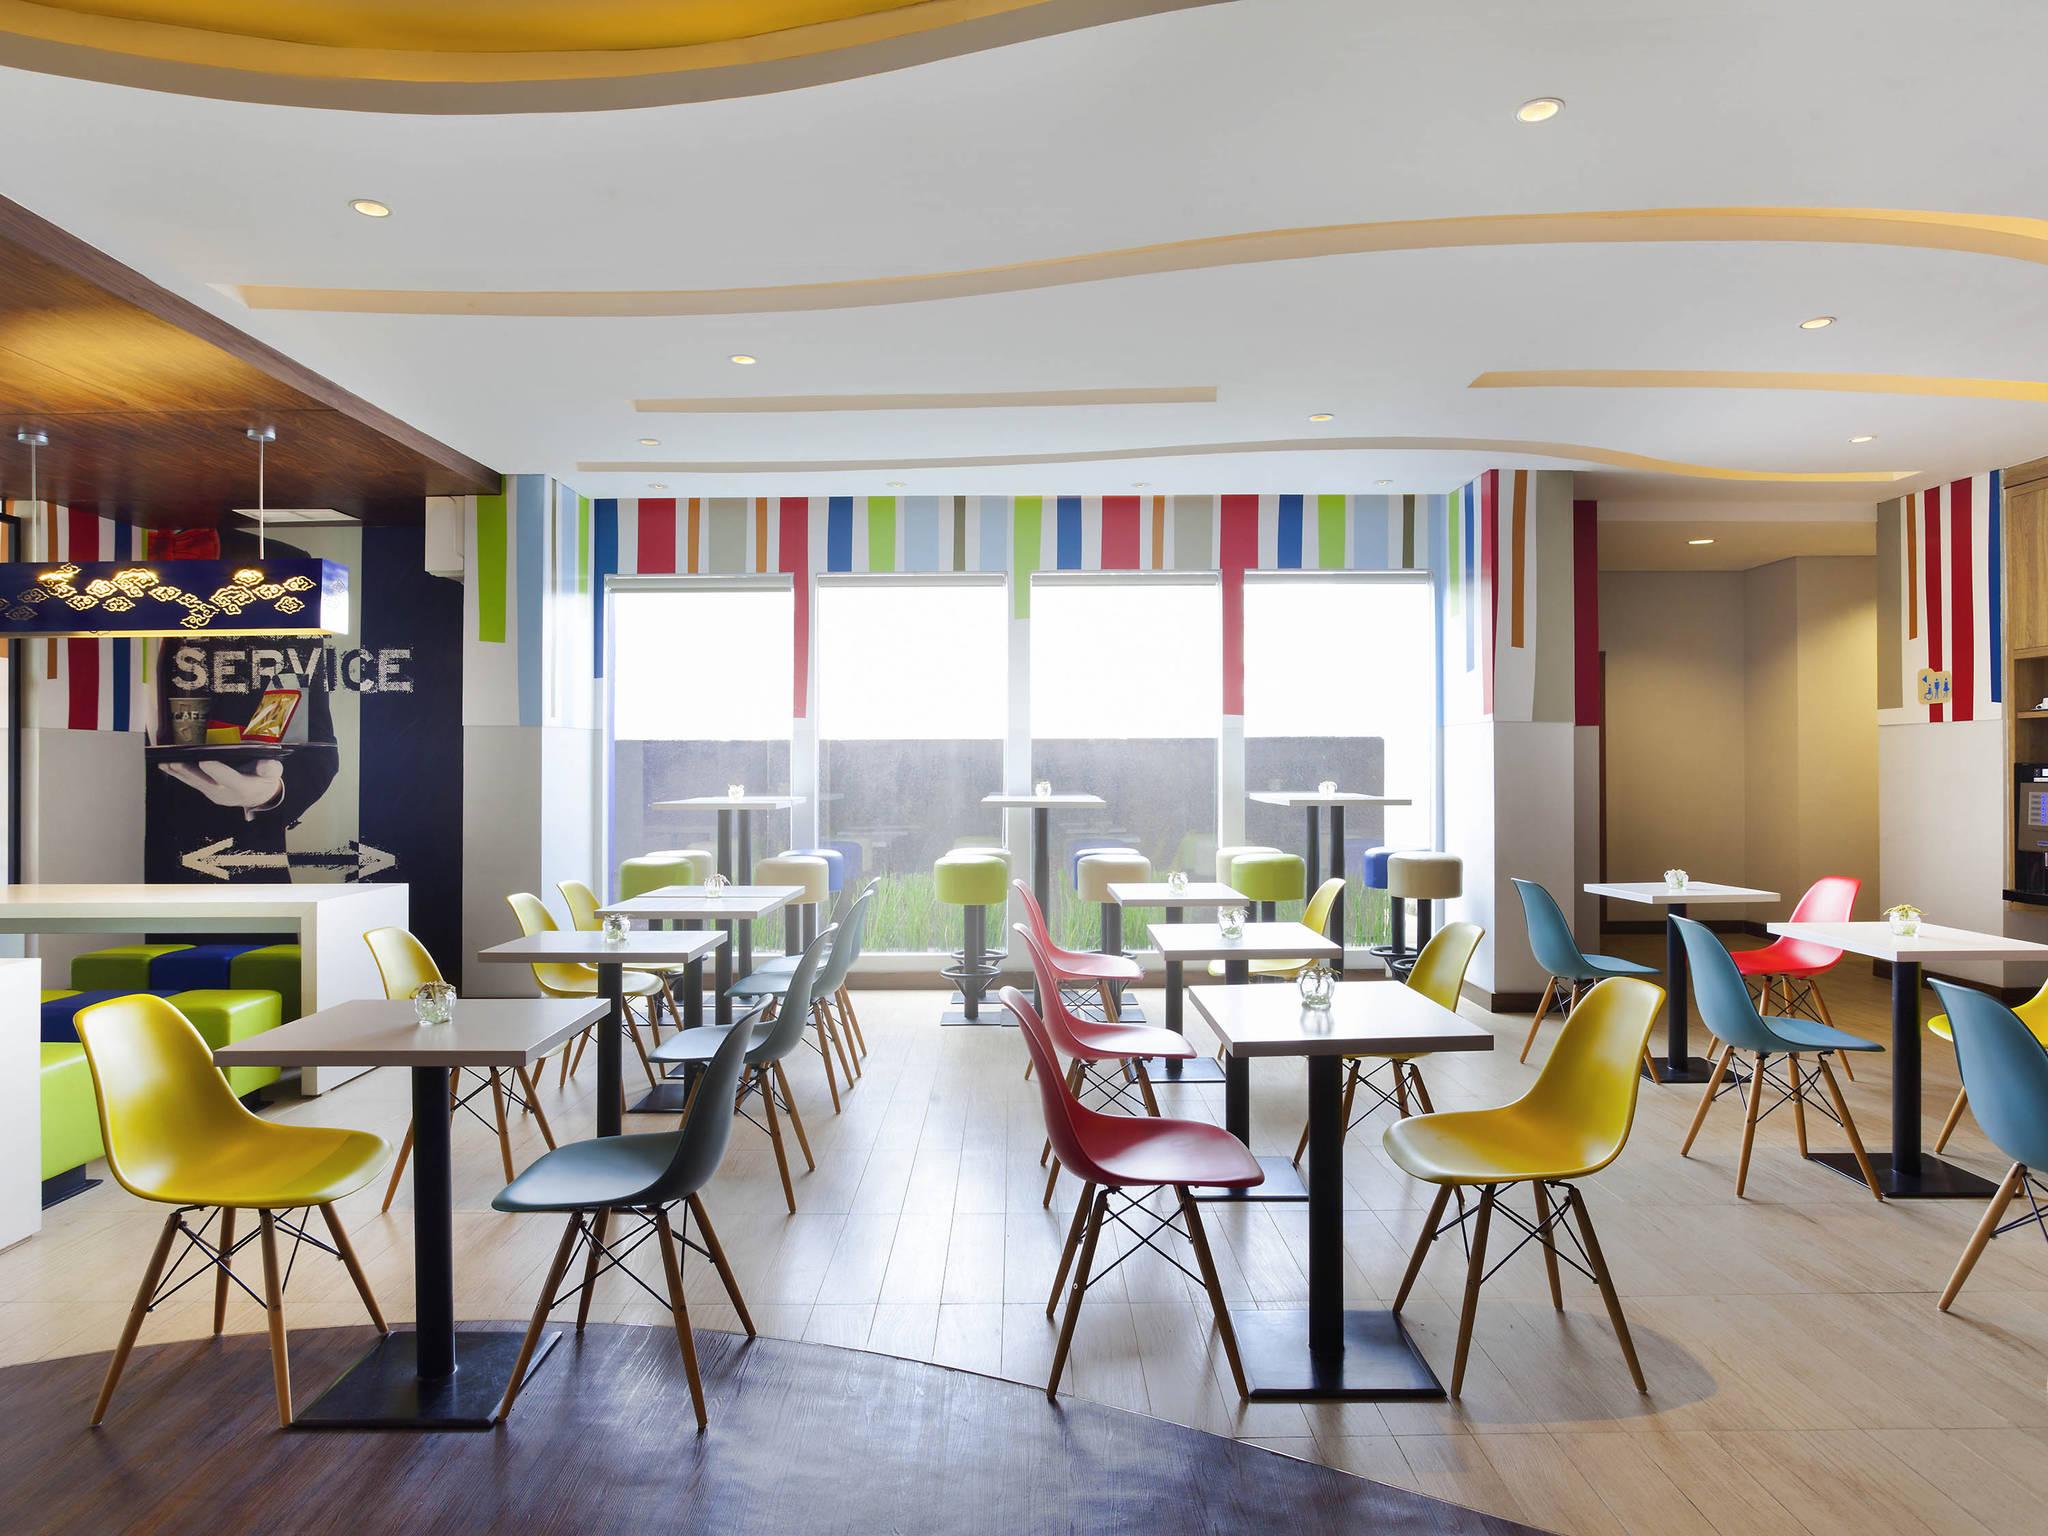 Hotel Budget In Bandung Ibis Asia Afrika Voucher Indomaret 100 X10pcs Services